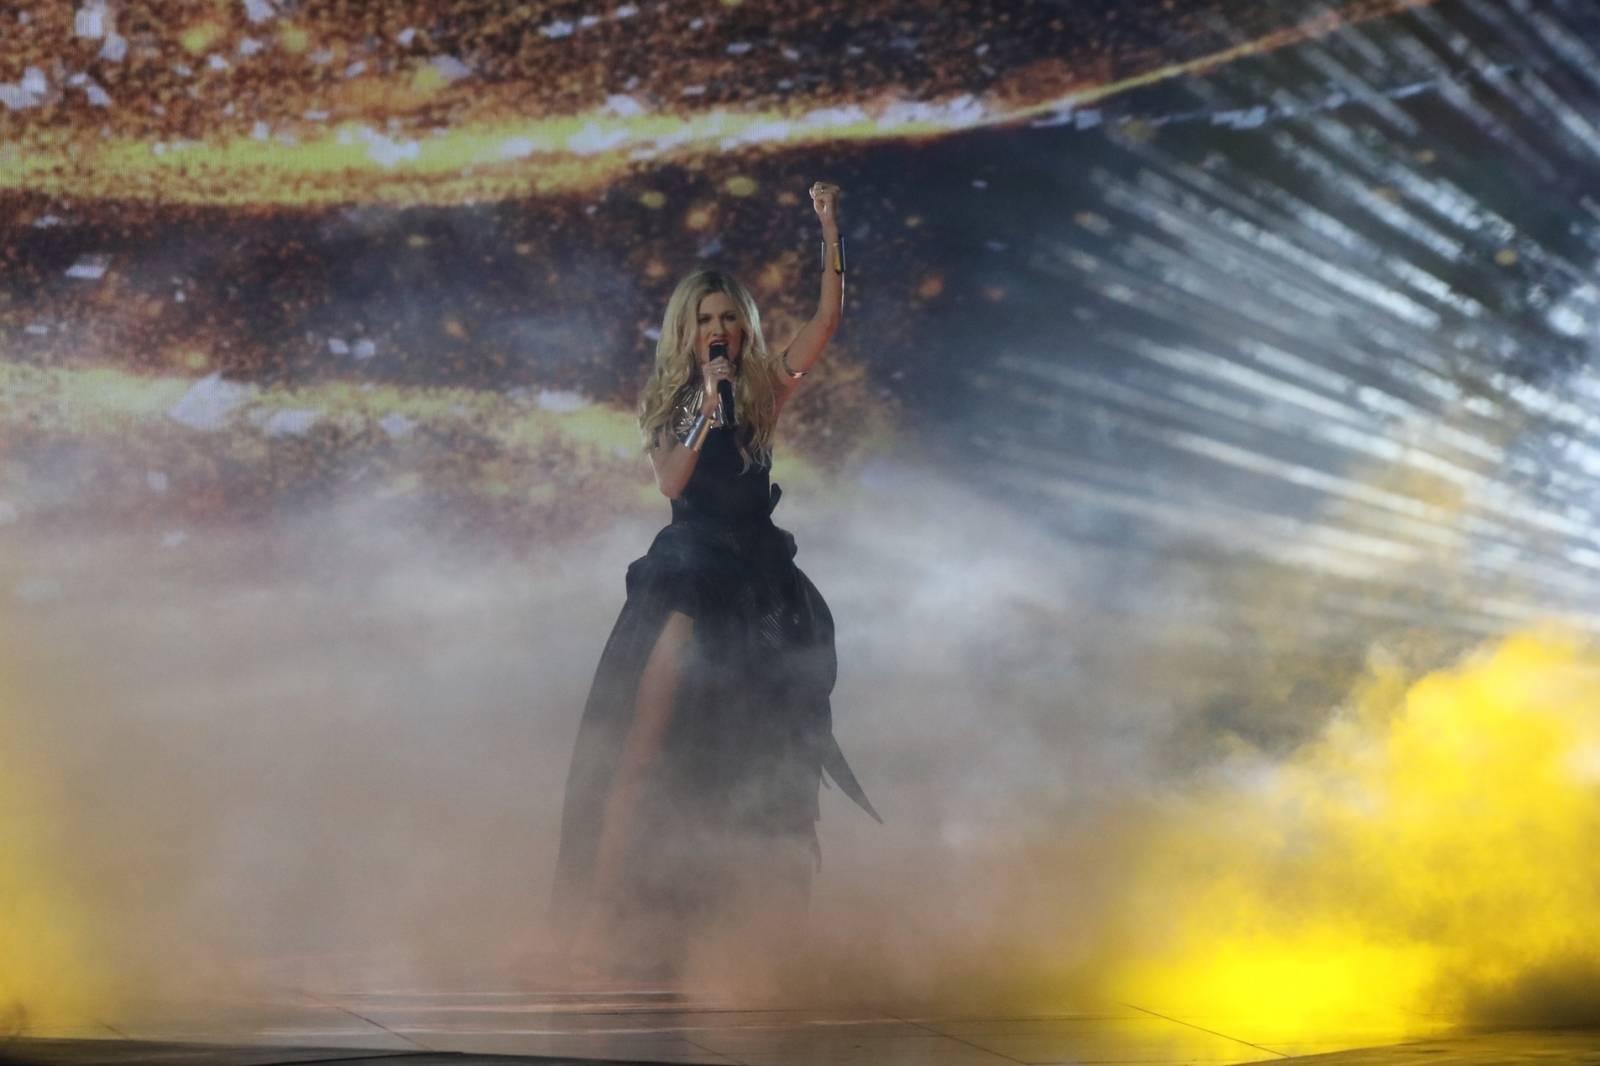 Eurovision Song Contest 2019 in Tel Aviv